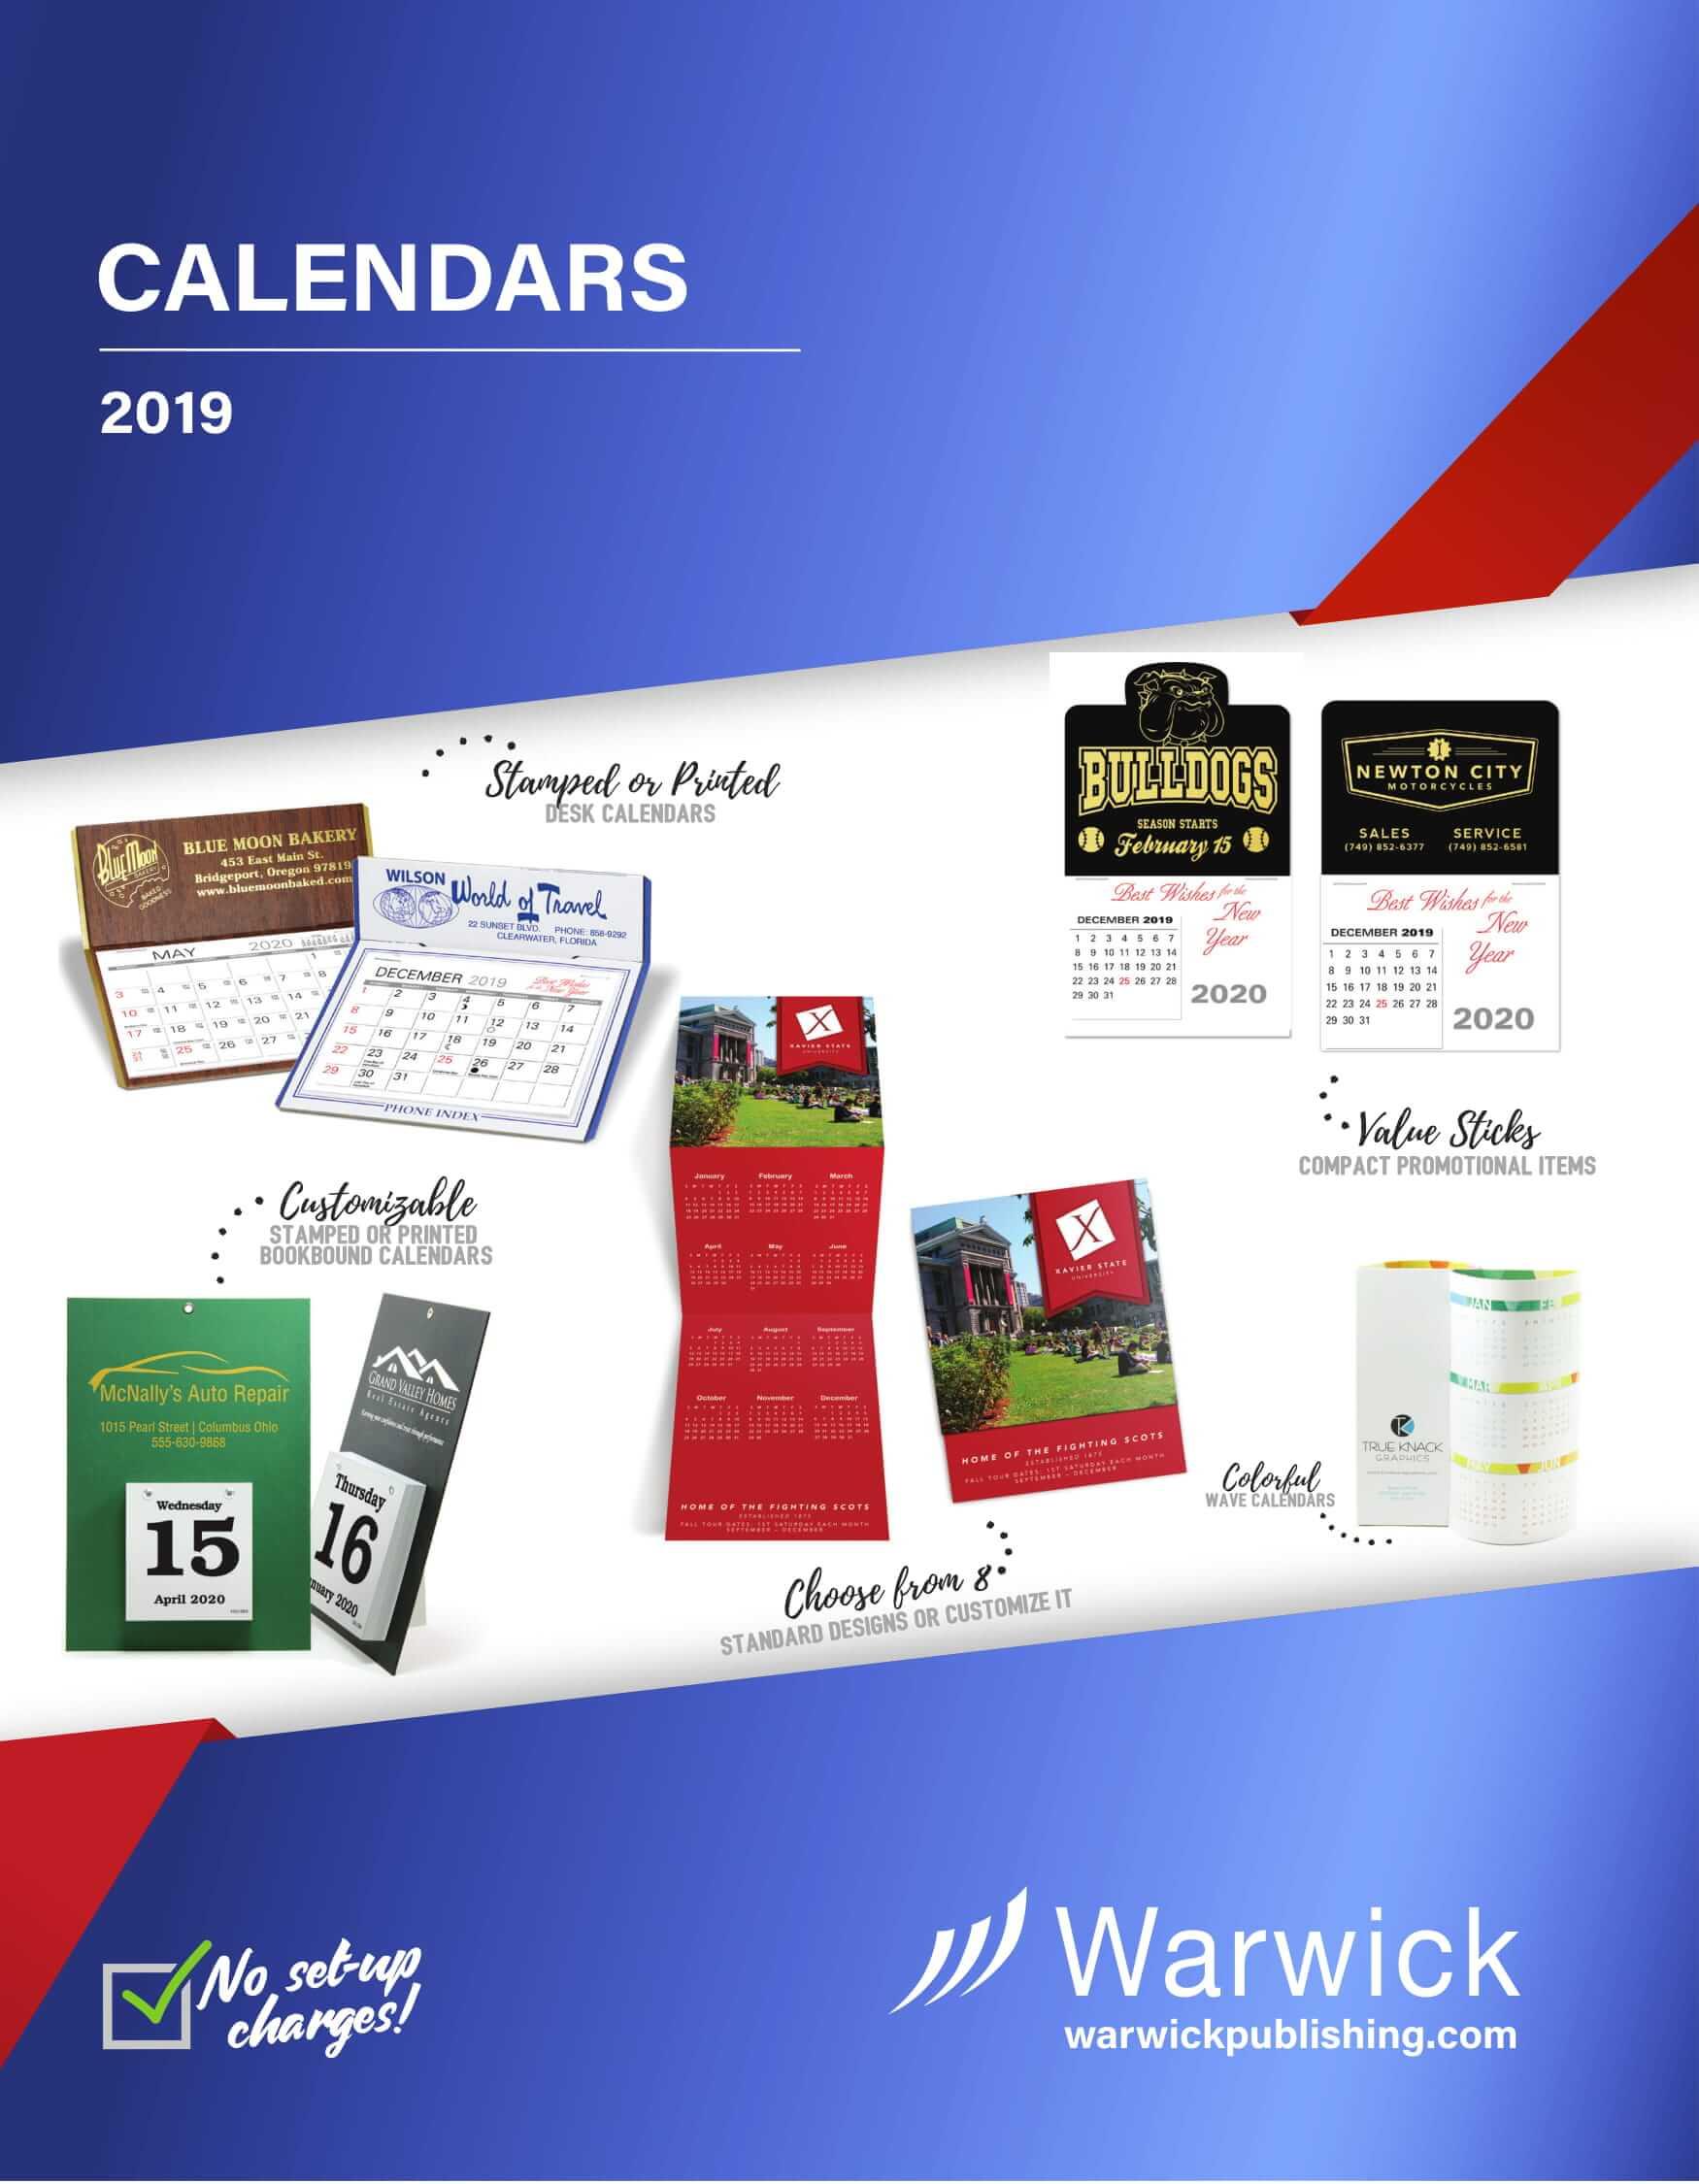 Calendars 2019